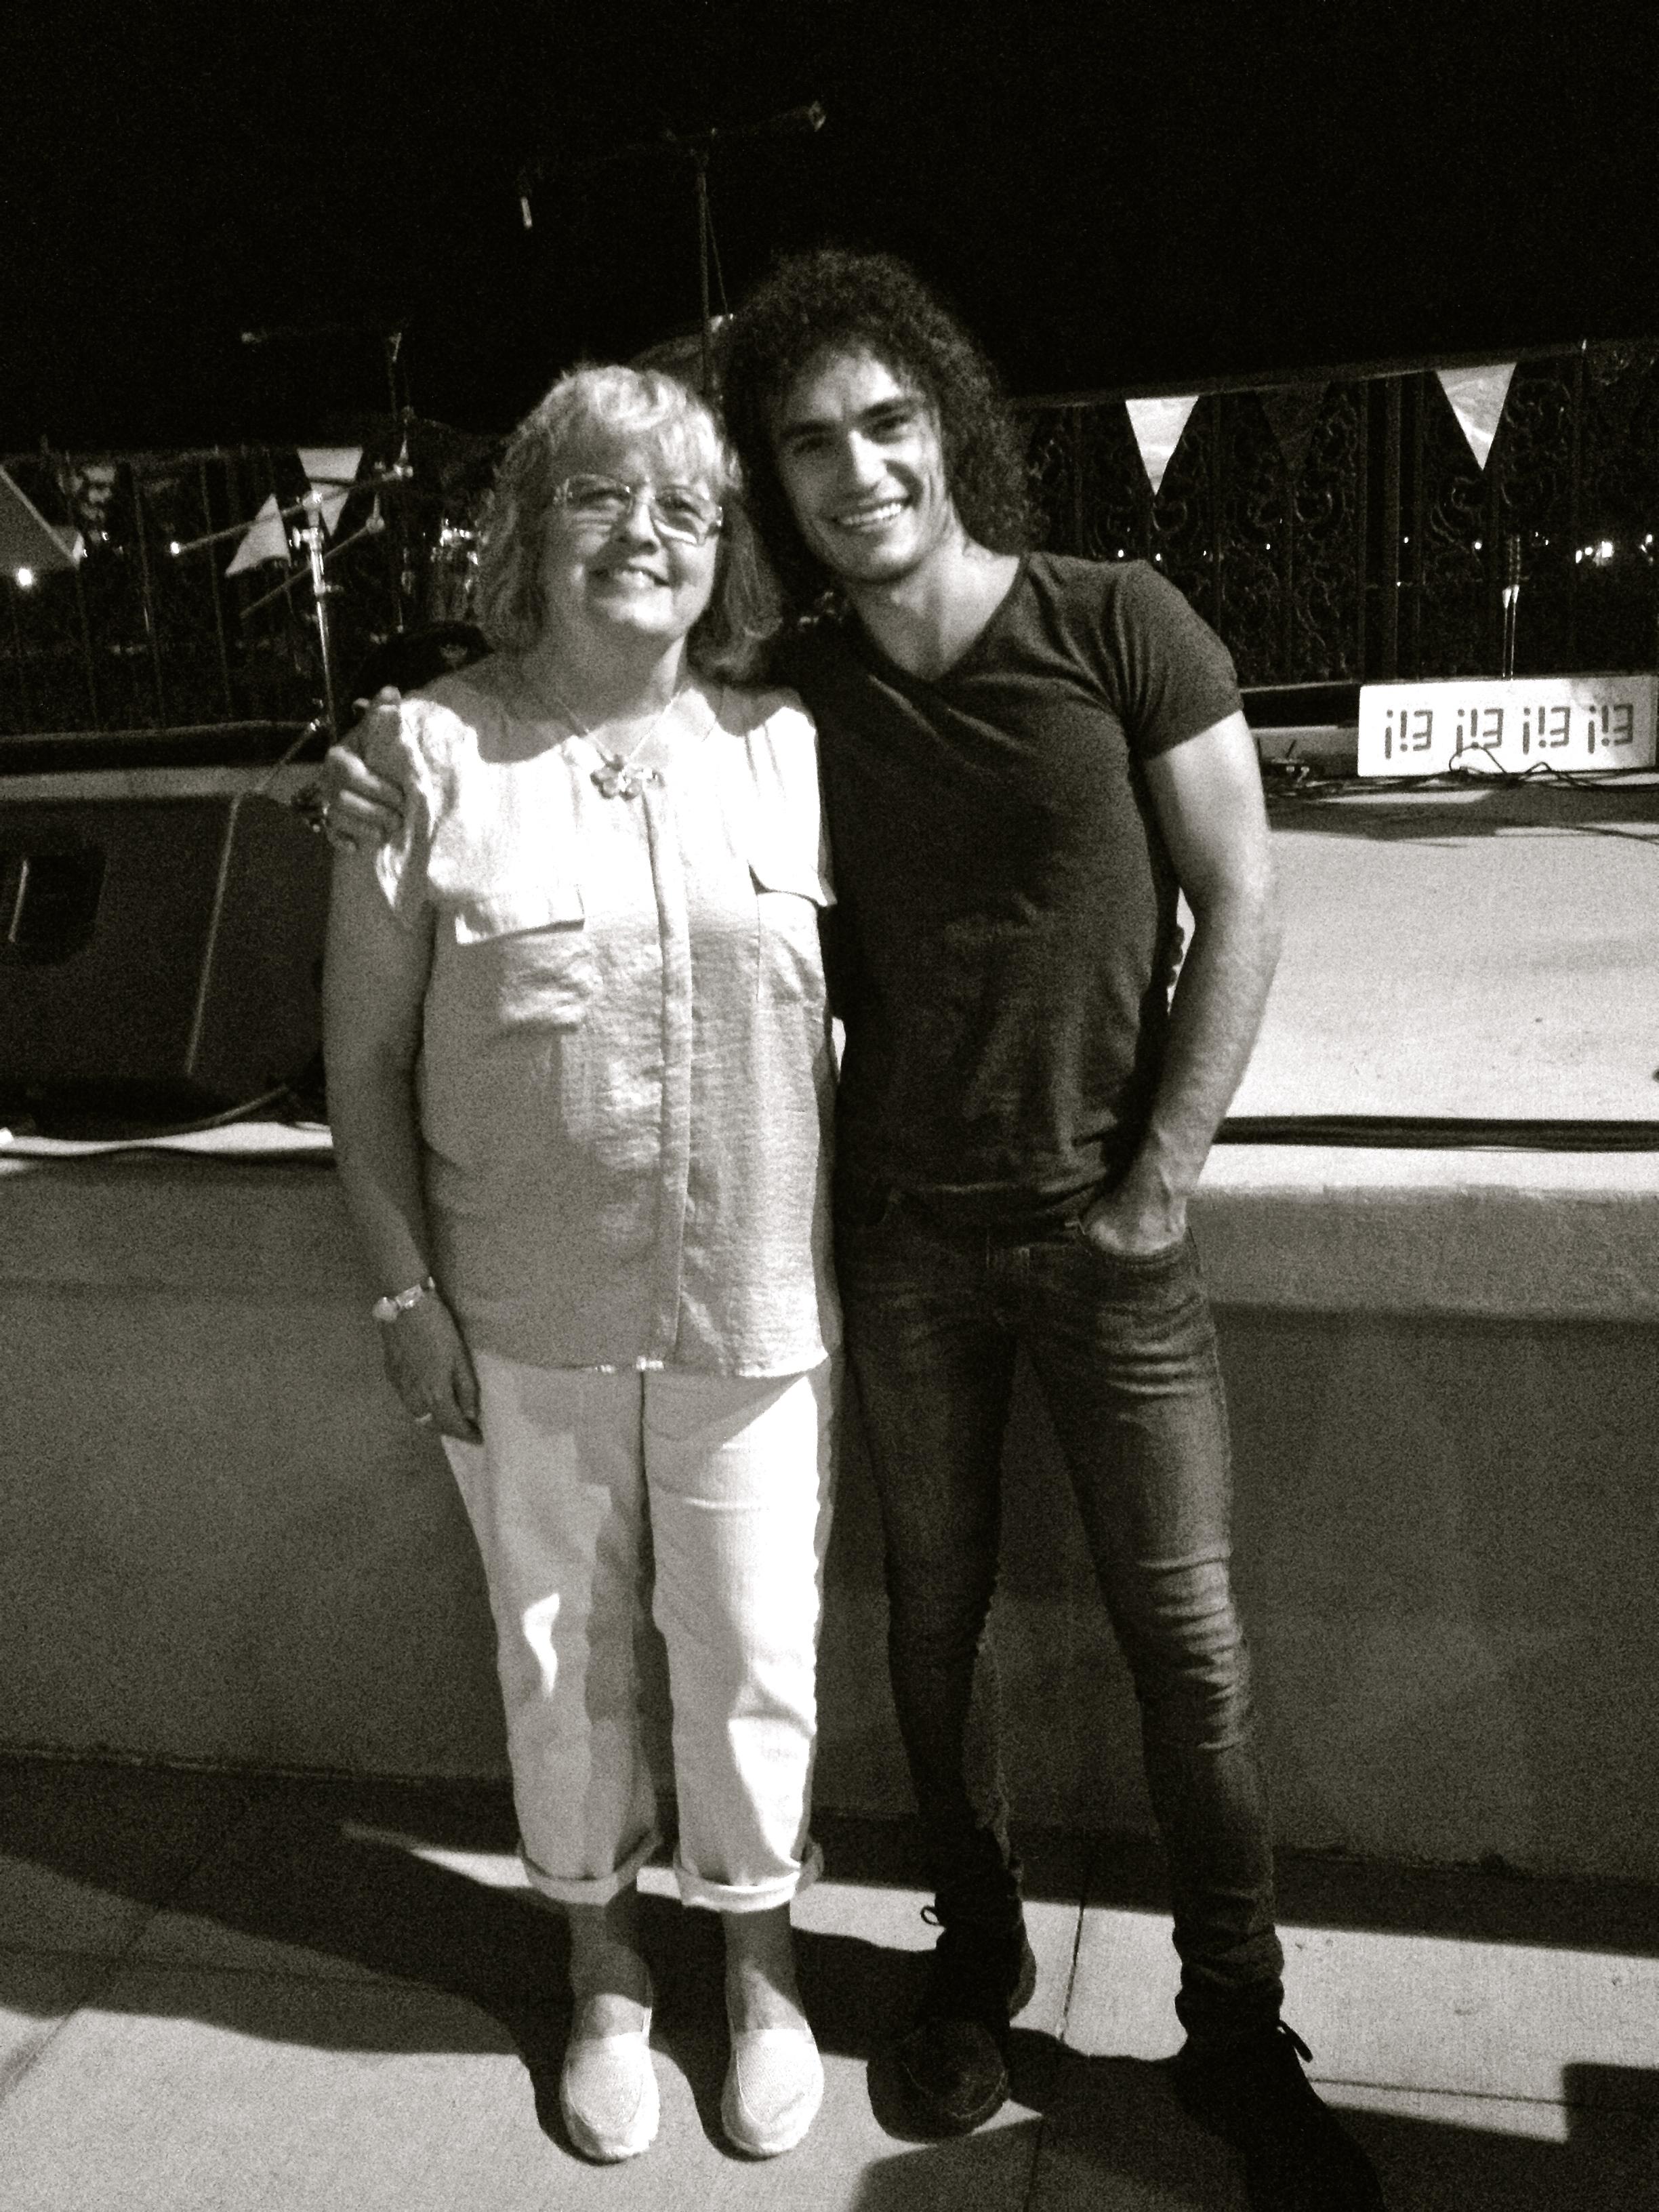 With Debbie Bibbs